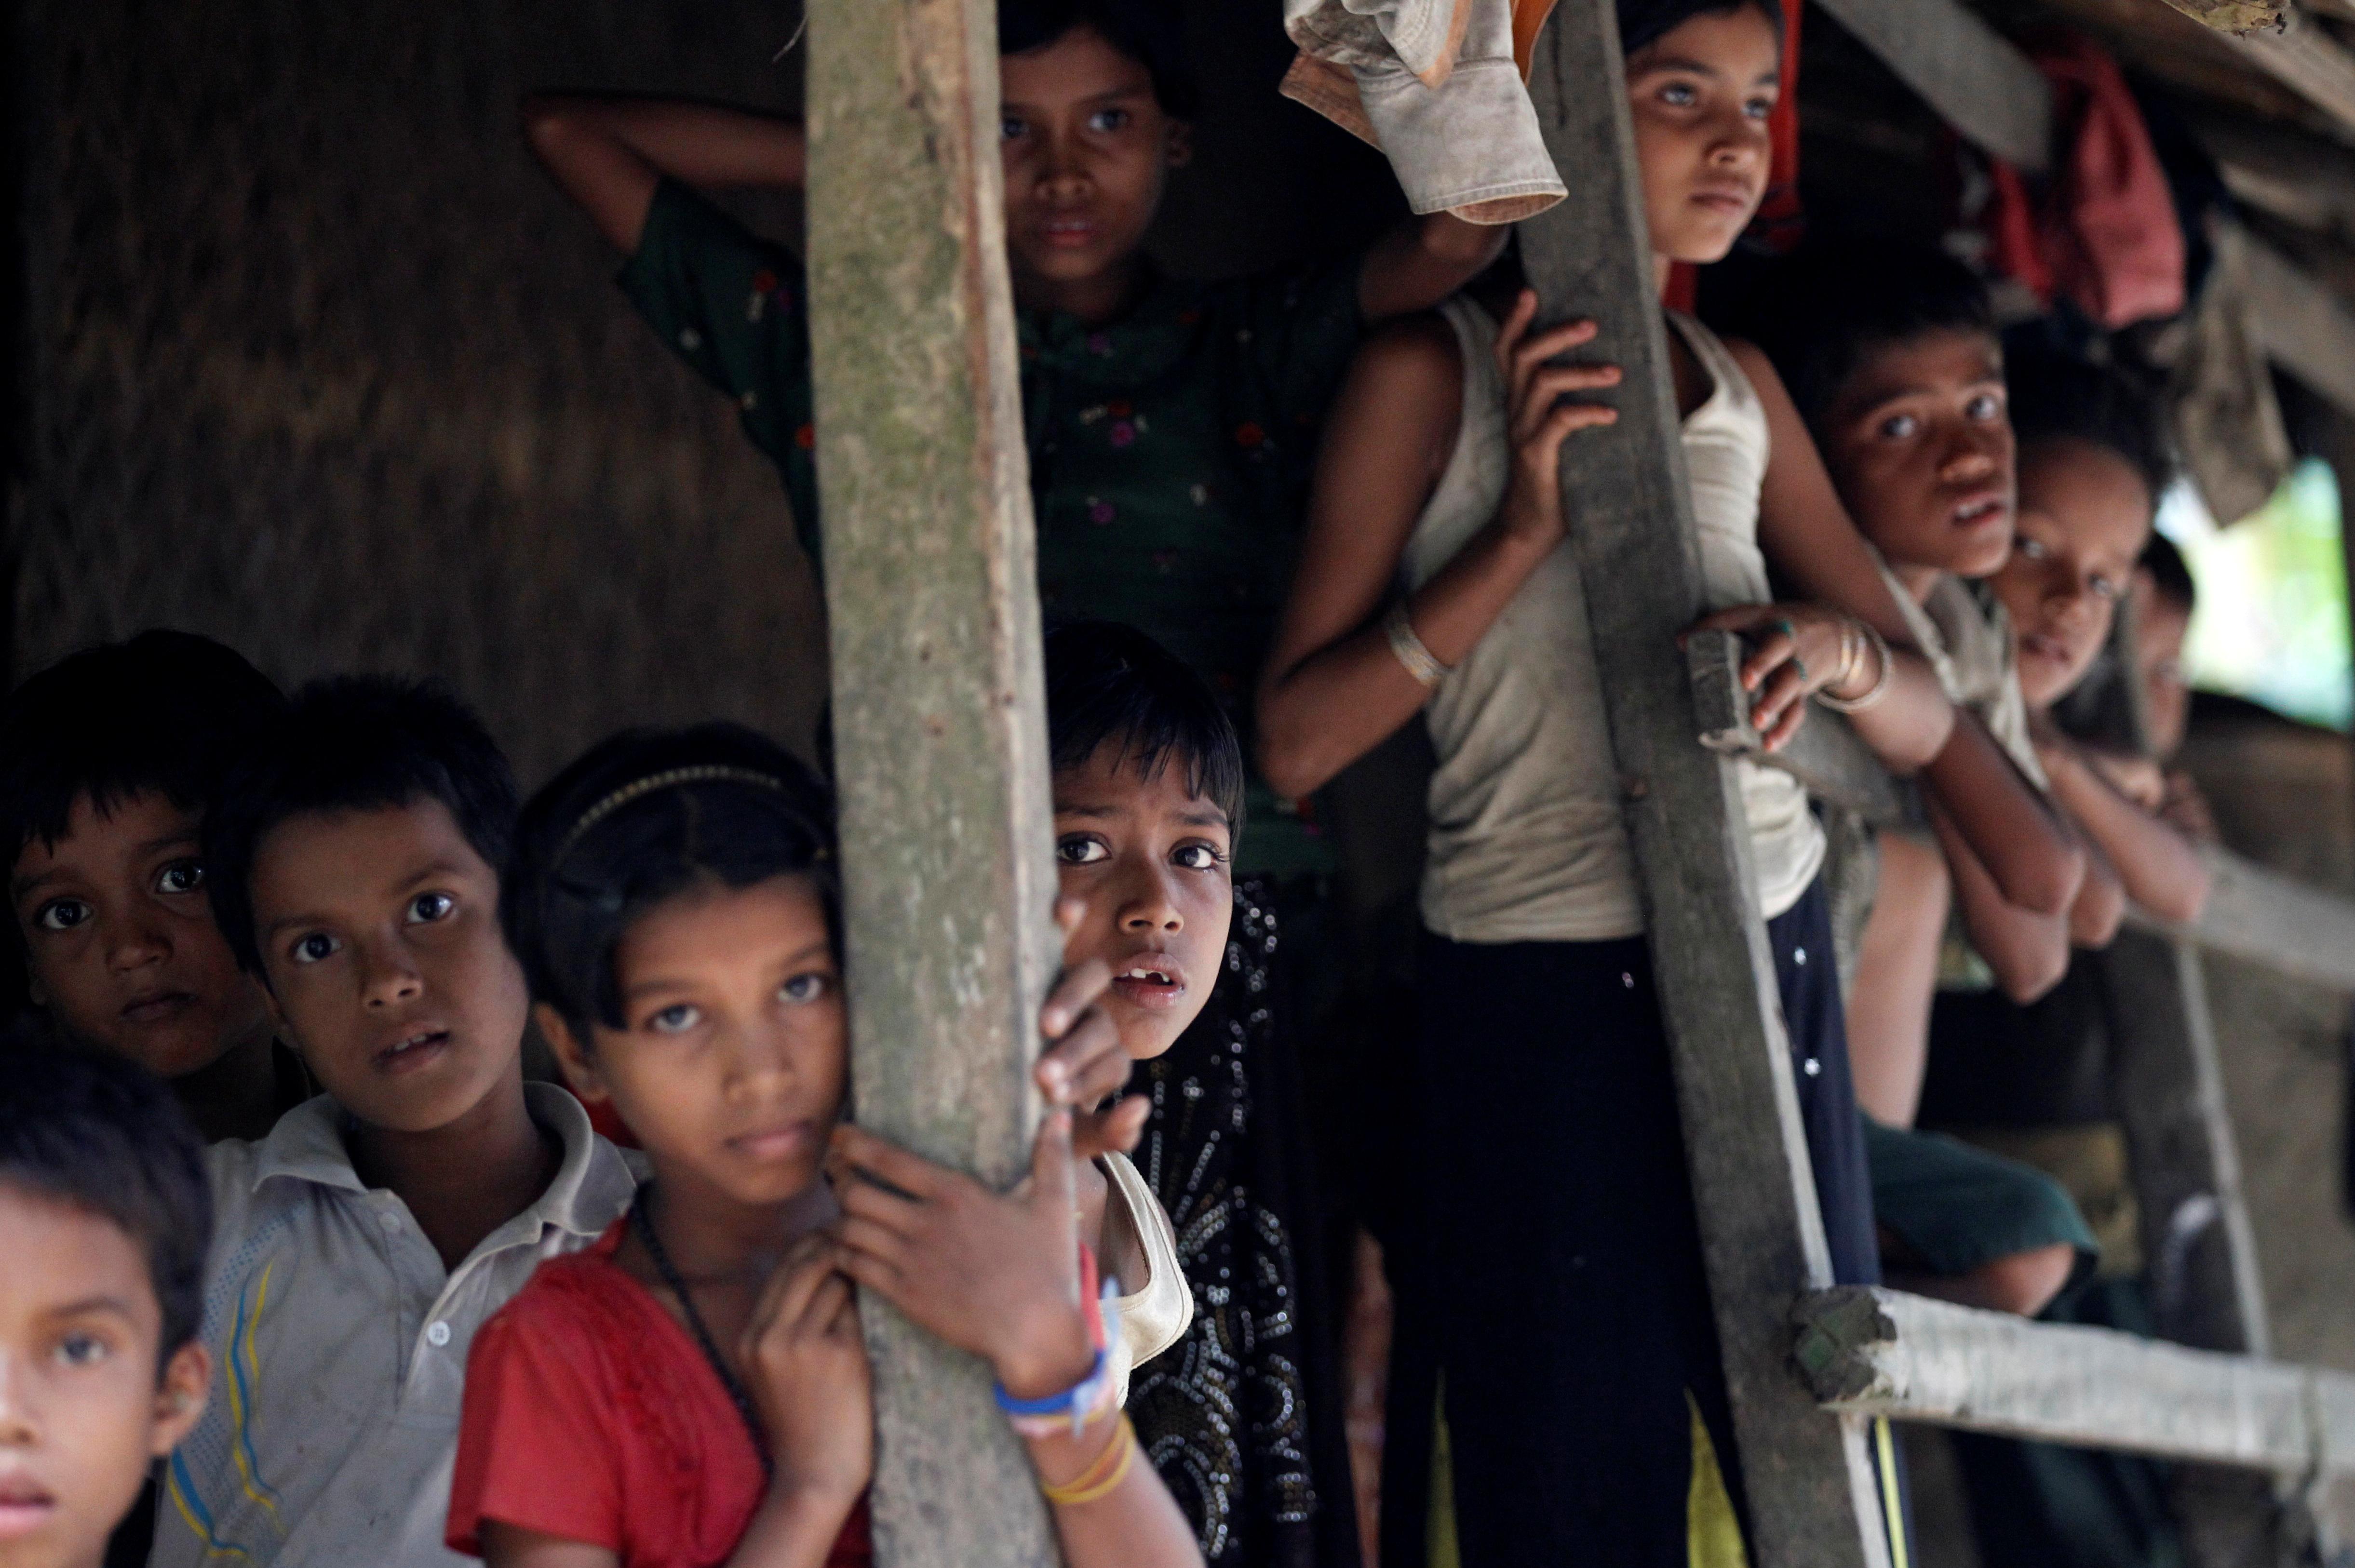 Rohingya Muslim children stand in U Shey Kya village outside Maungdaw in Rakhine state, Burma, on Oct. 27, 2016